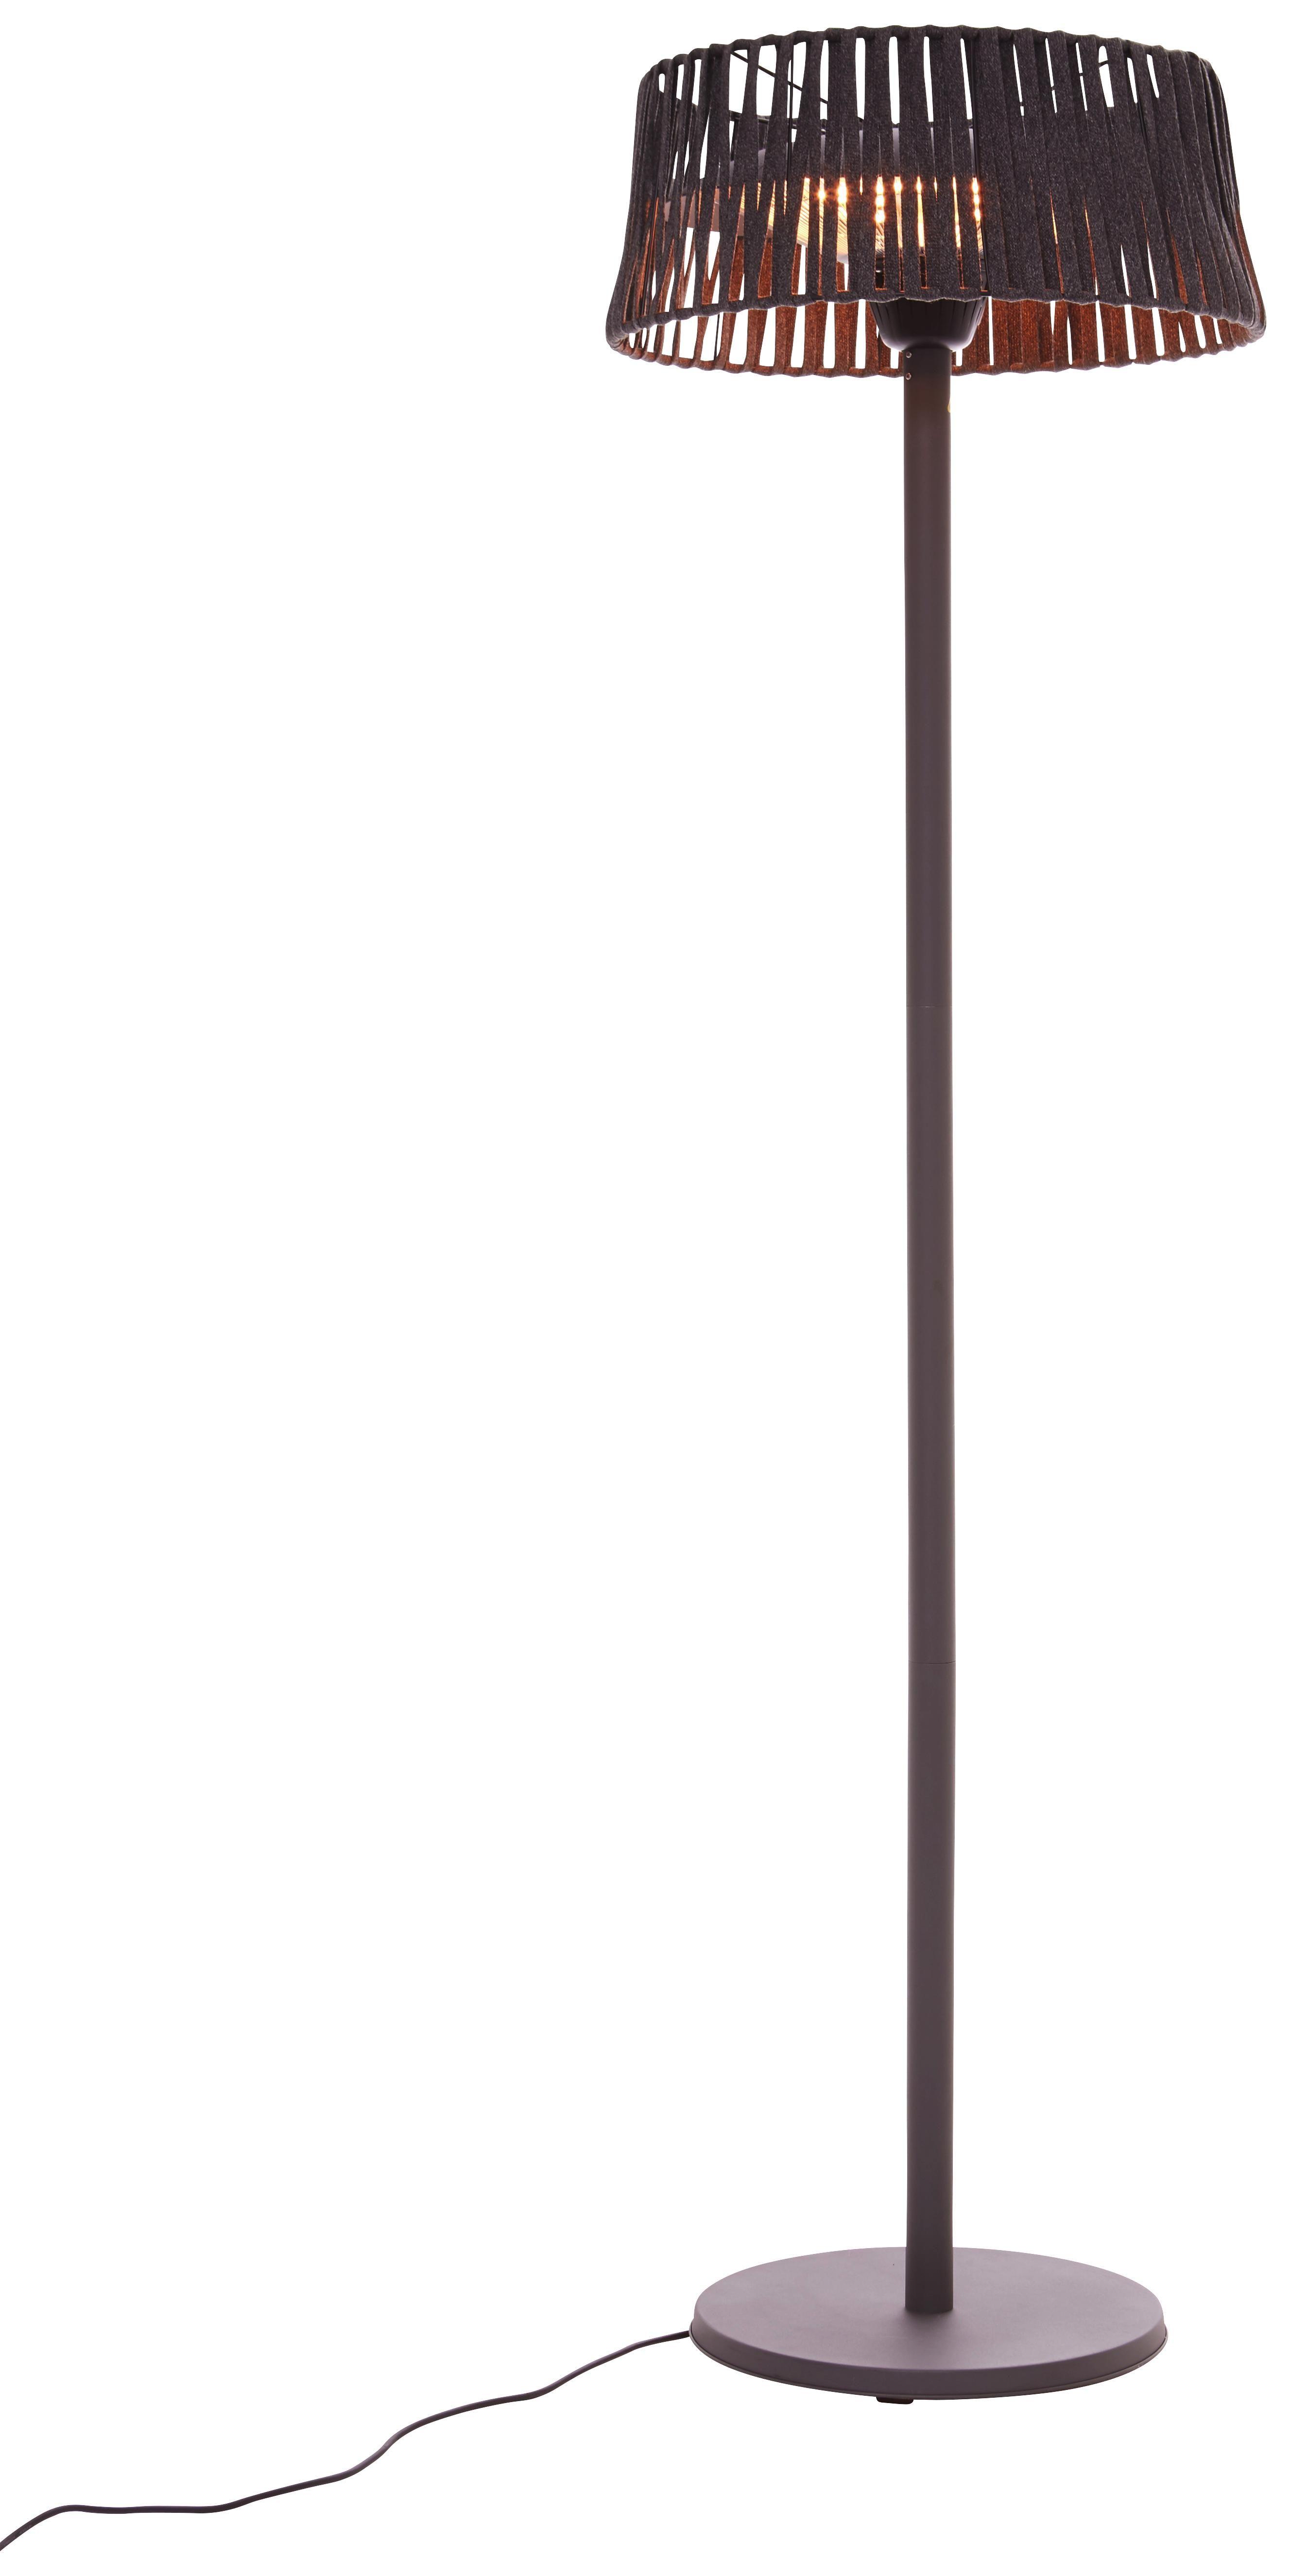 Terrassenstrahler Marlon 900/1200/2100w - Grau, MODERN, Metall (210cm) - Modern Living